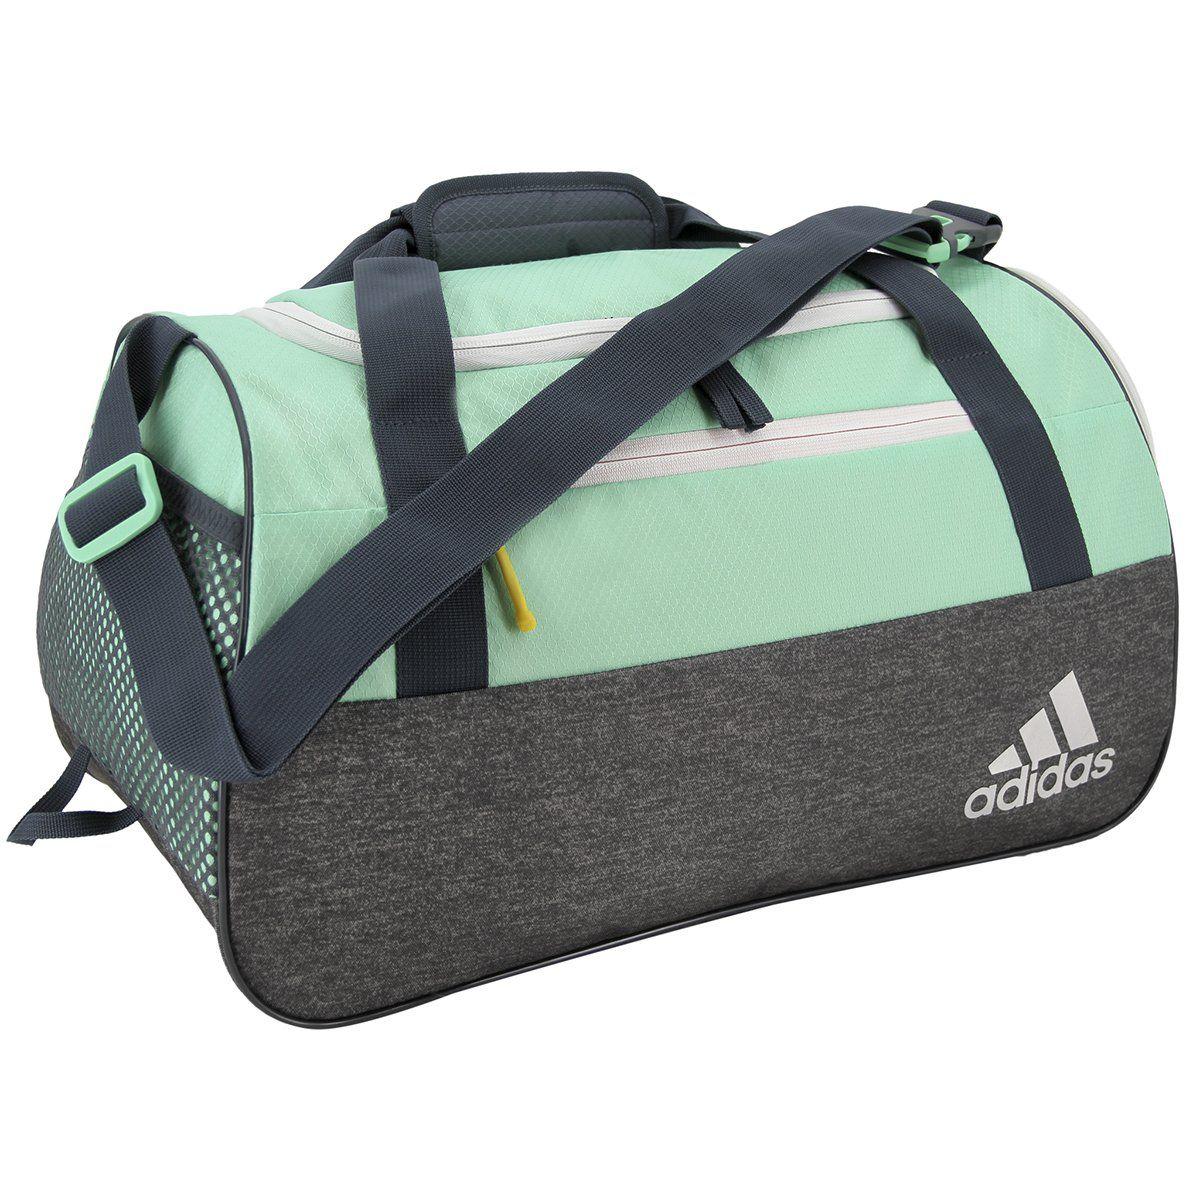 29bf99d1f818 Amazon.com  Adidas Squad III Duffel Bag